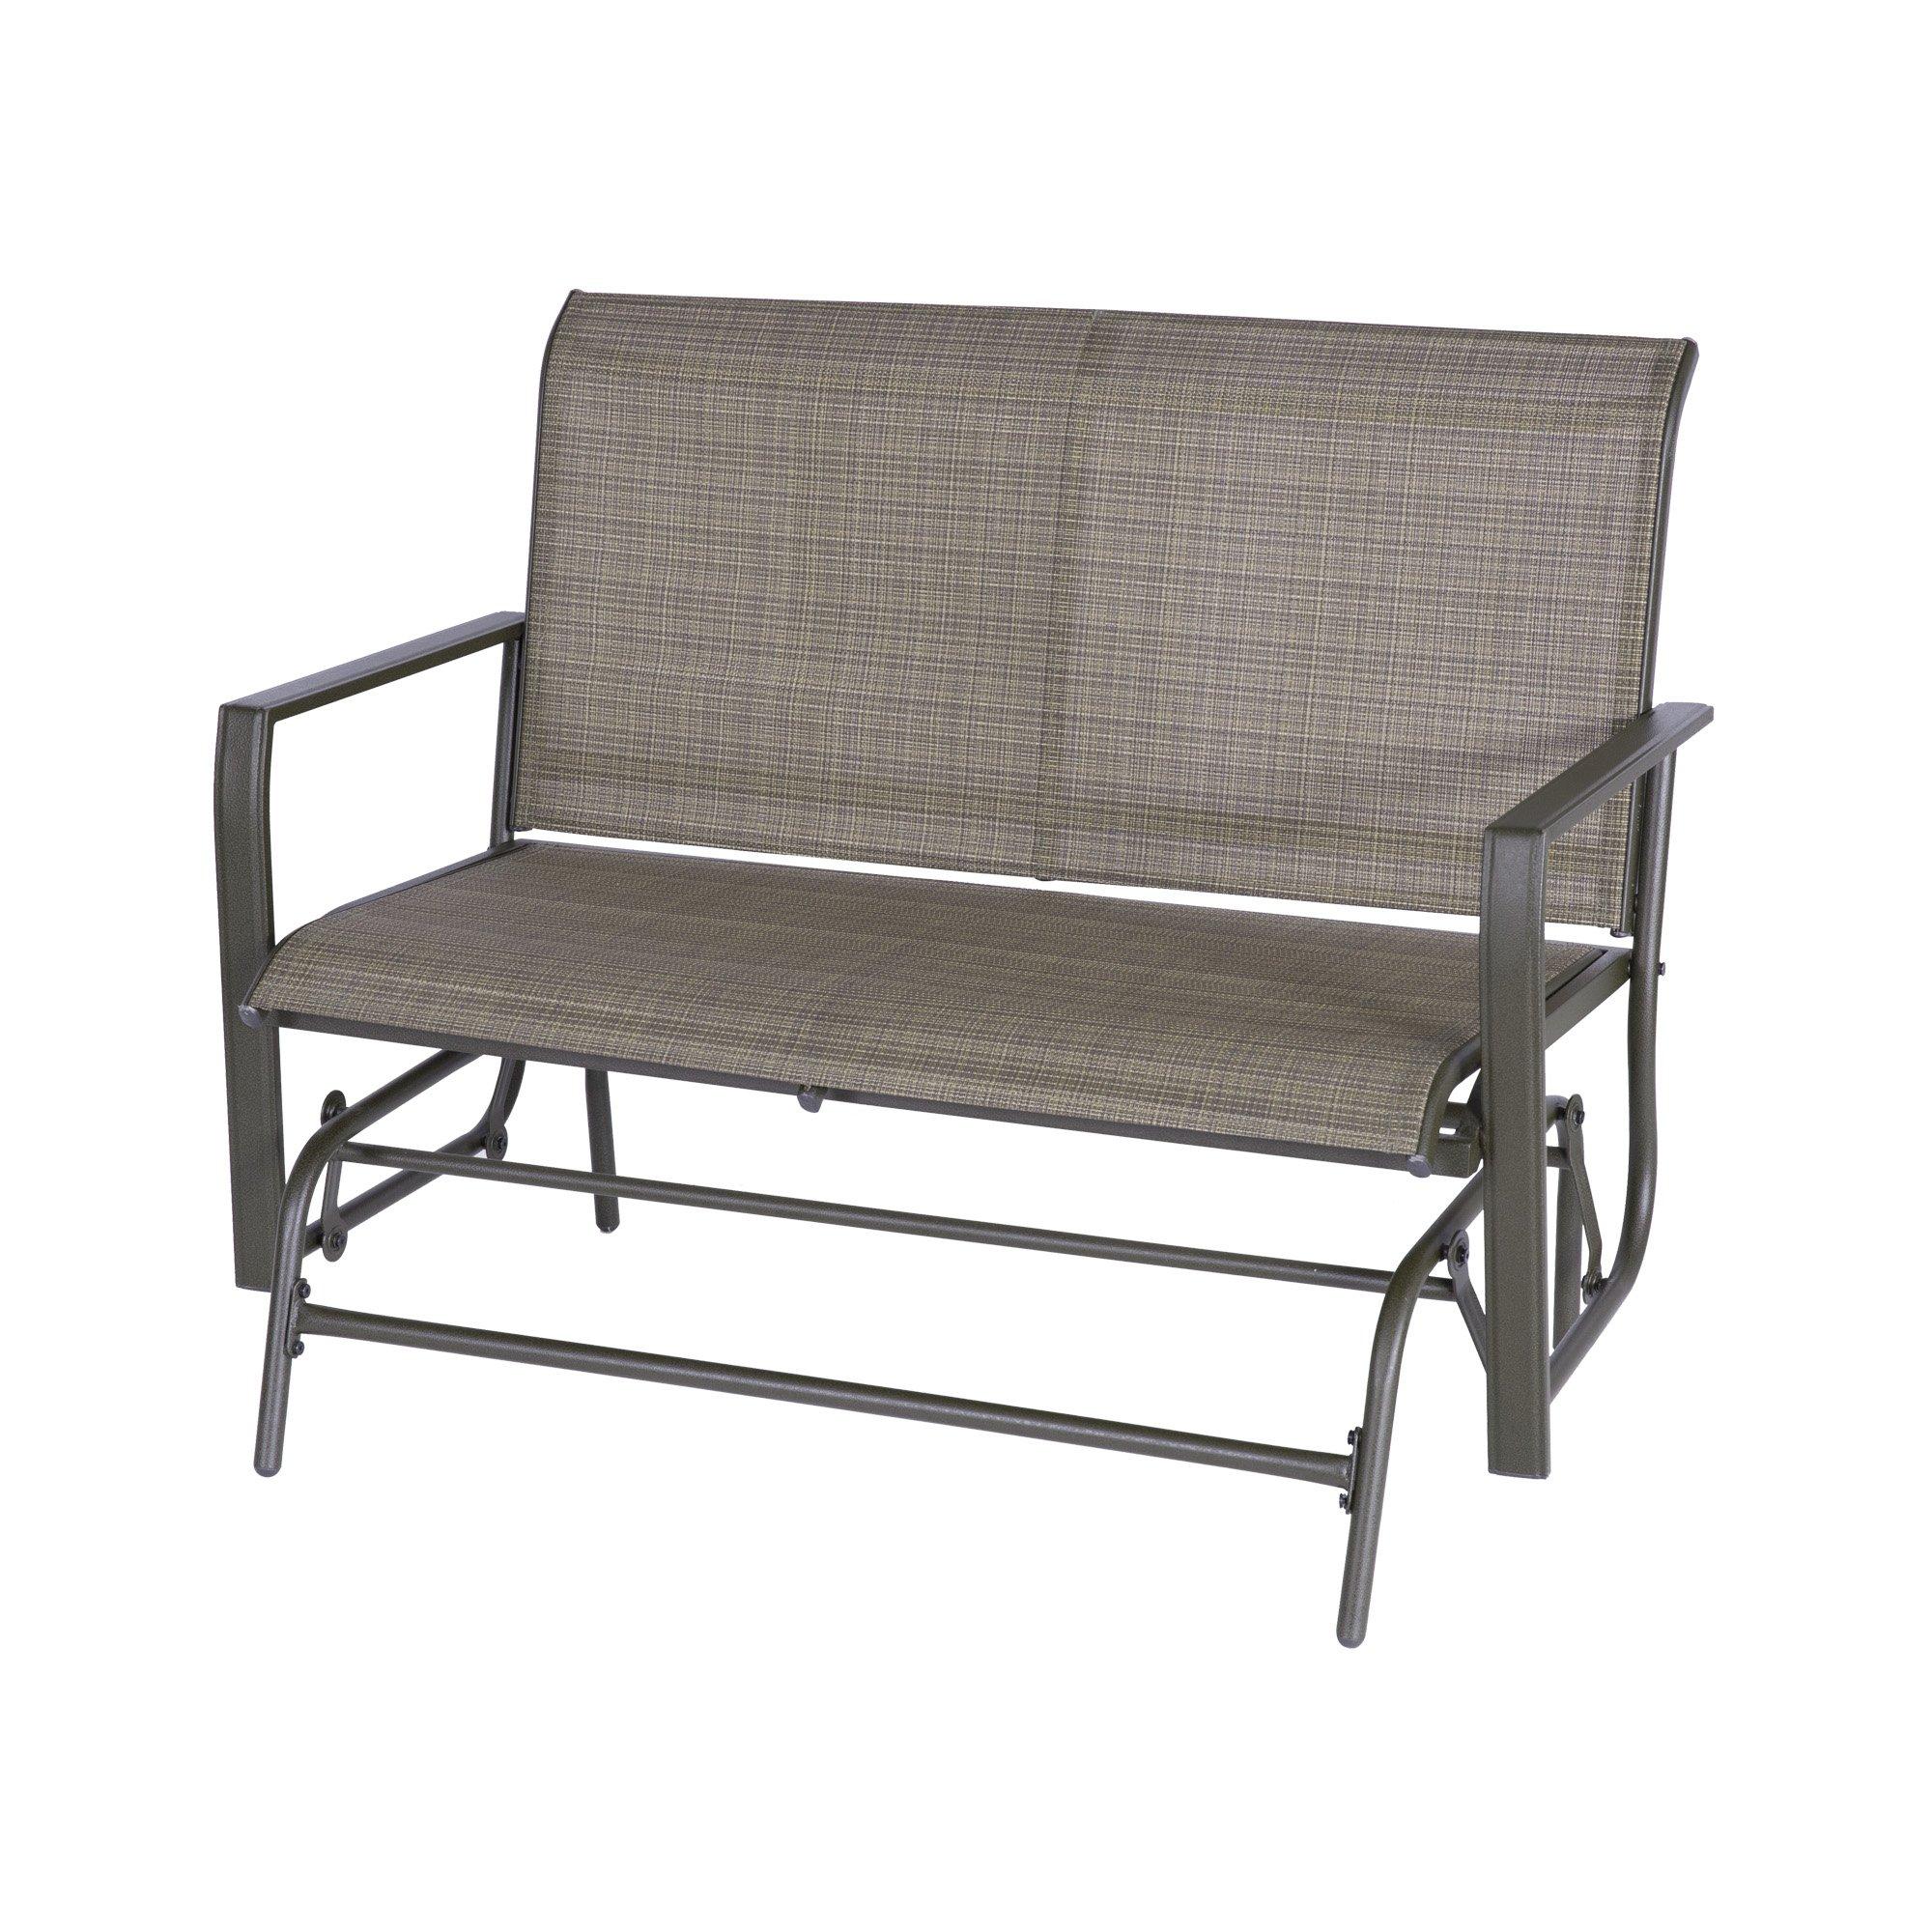 Buy Outdoor Patio Leisure Swing Rocker Glider Bench Loveseat For Outdoor Patio Swing Glider Benches (View 12 of 25)